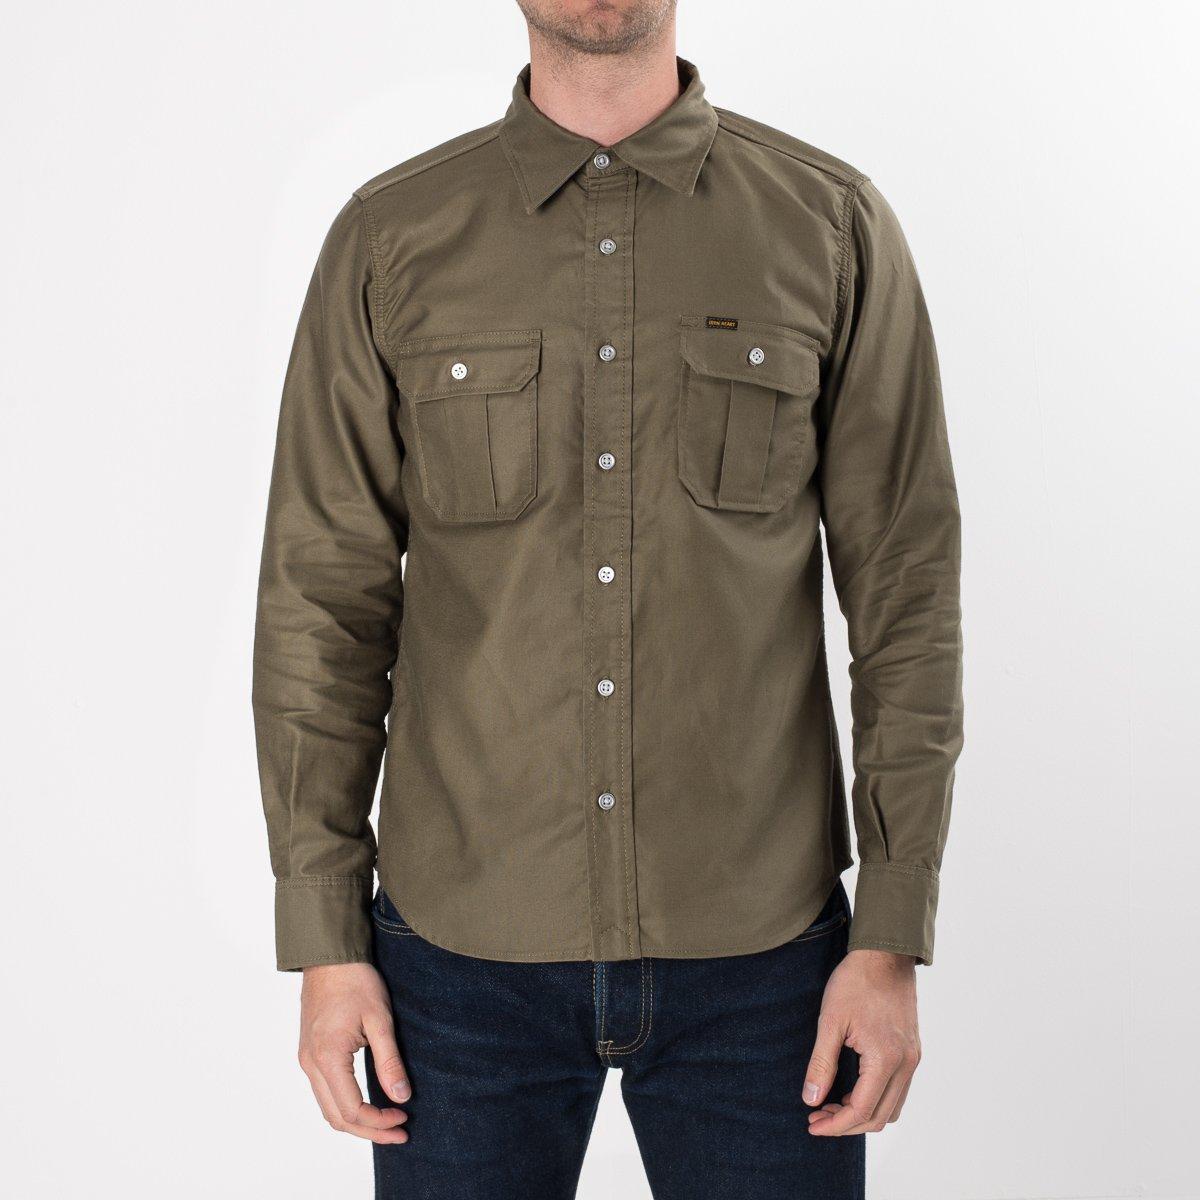 Olive Super Tough Cotton Military Work Shirt